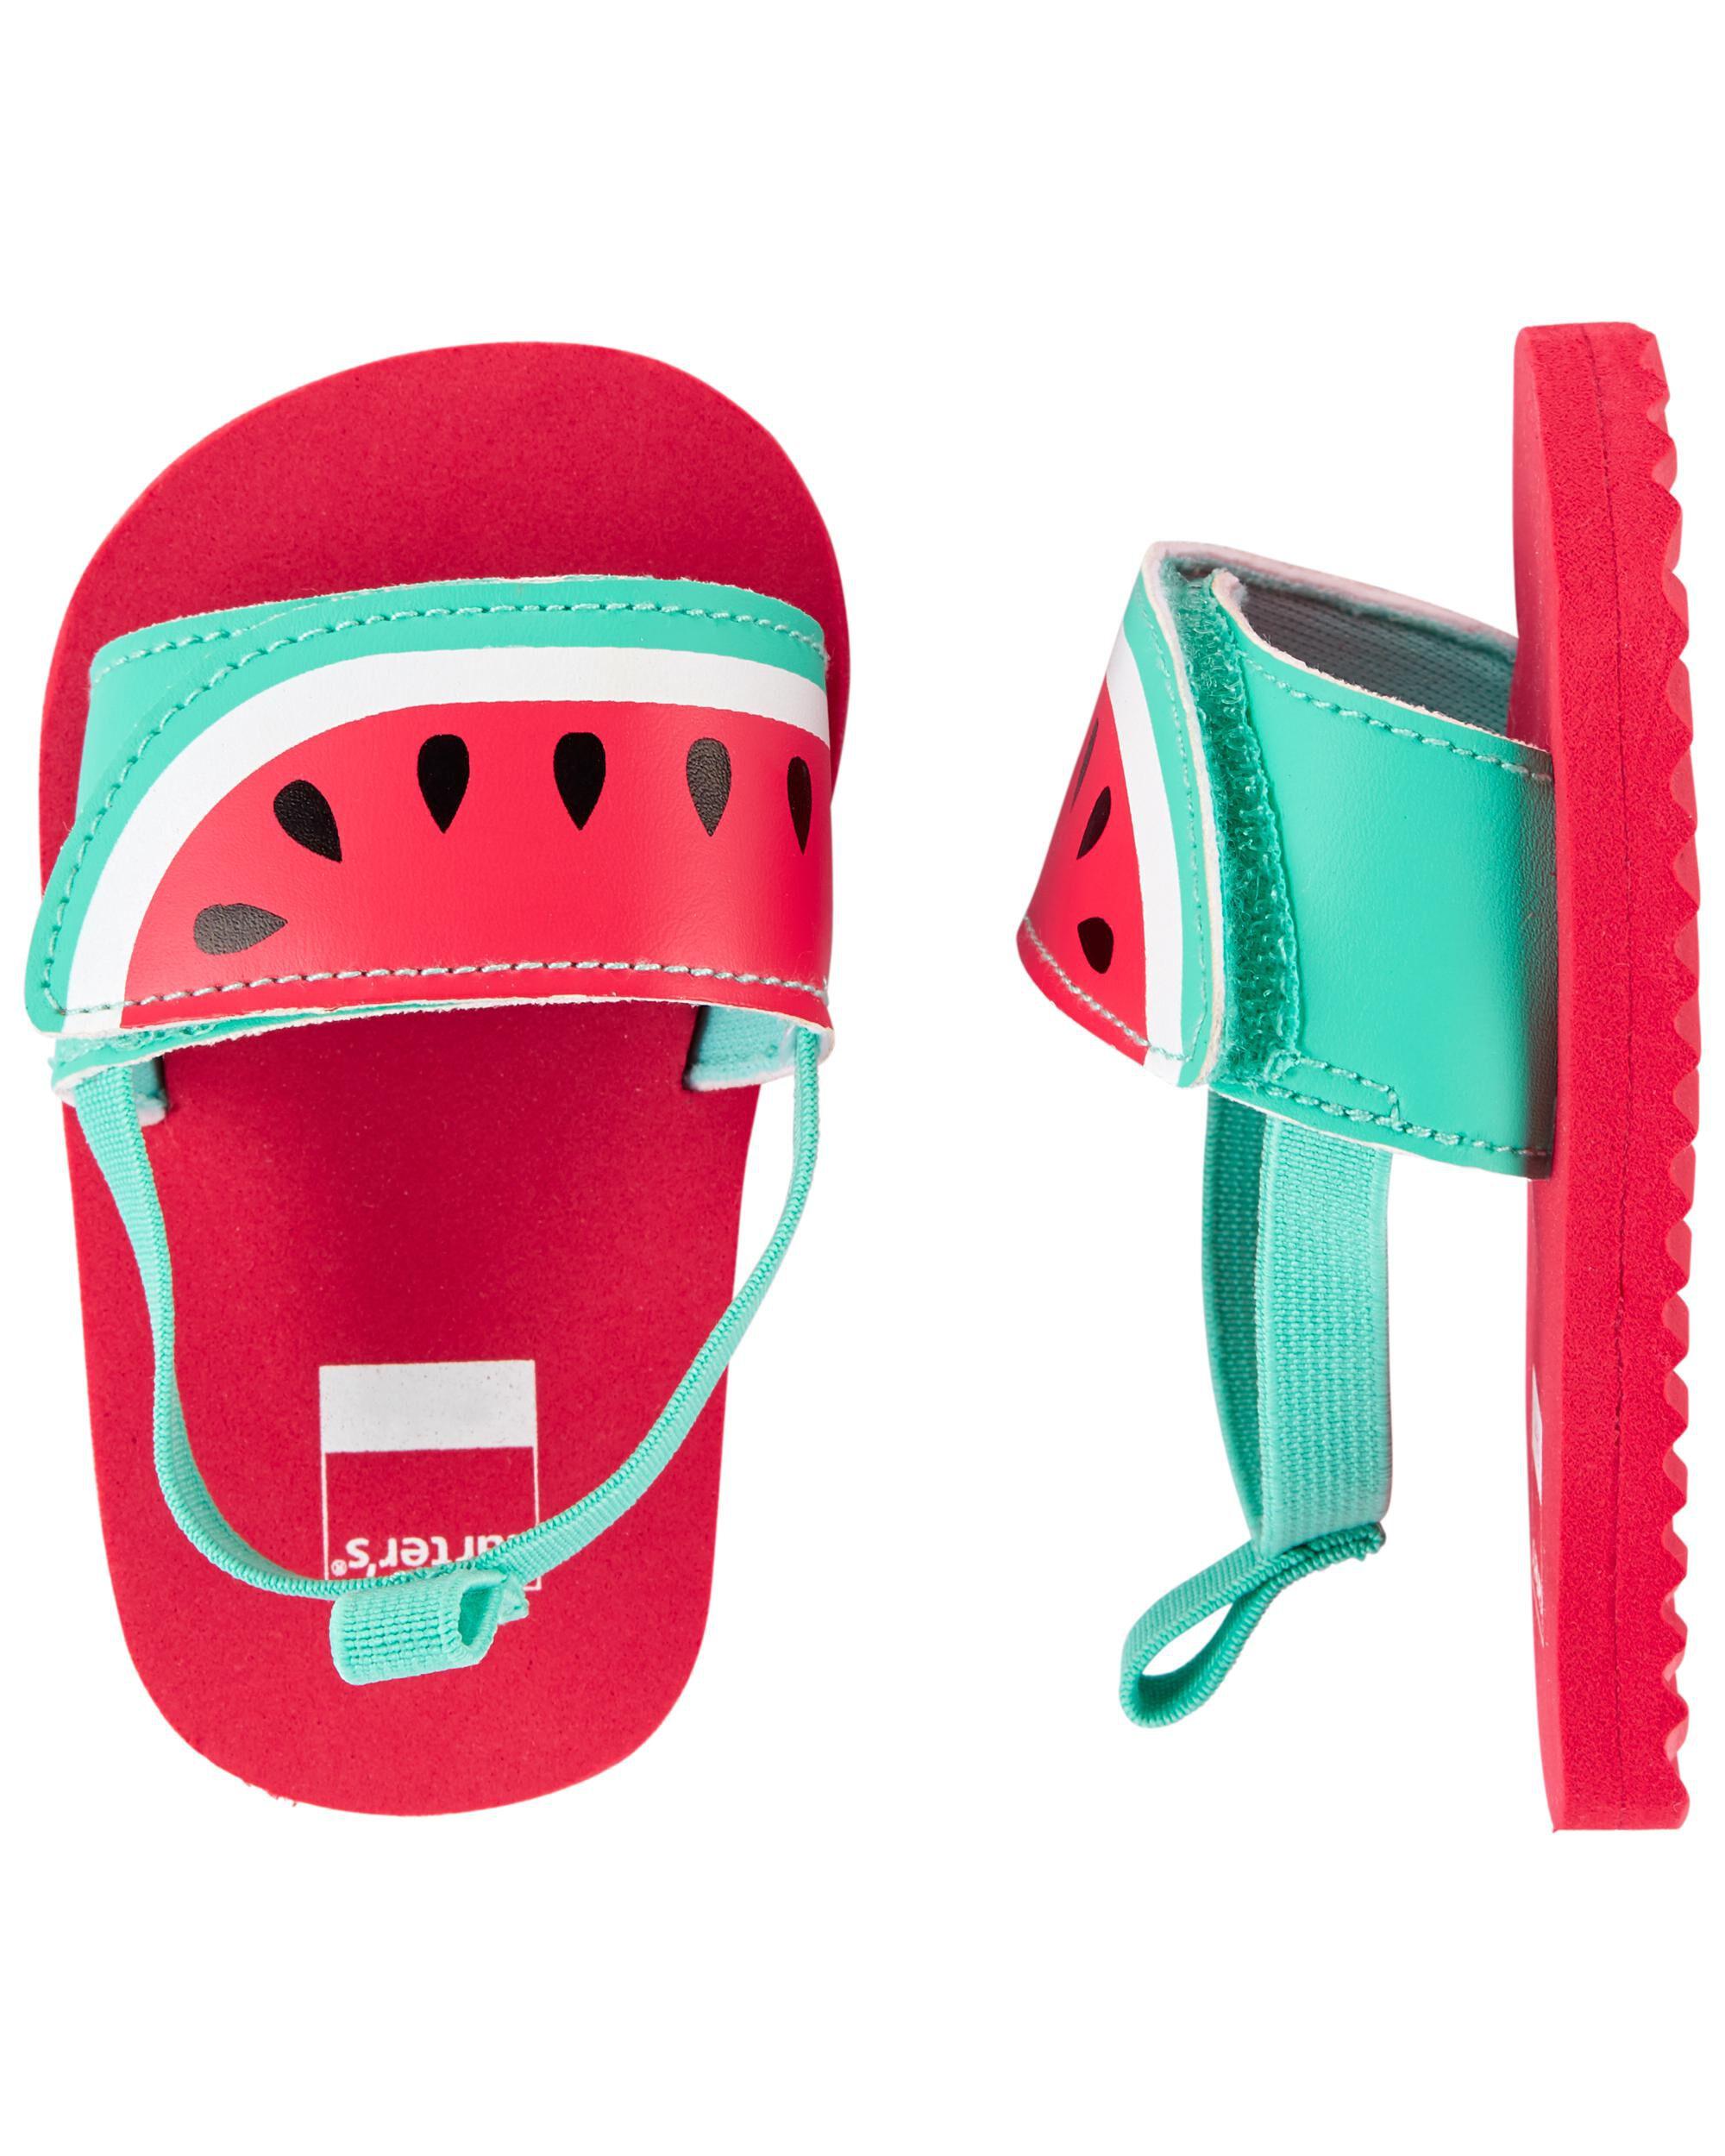 Oshkoshbgosh Carters Watermelon Slides Baby Shoes